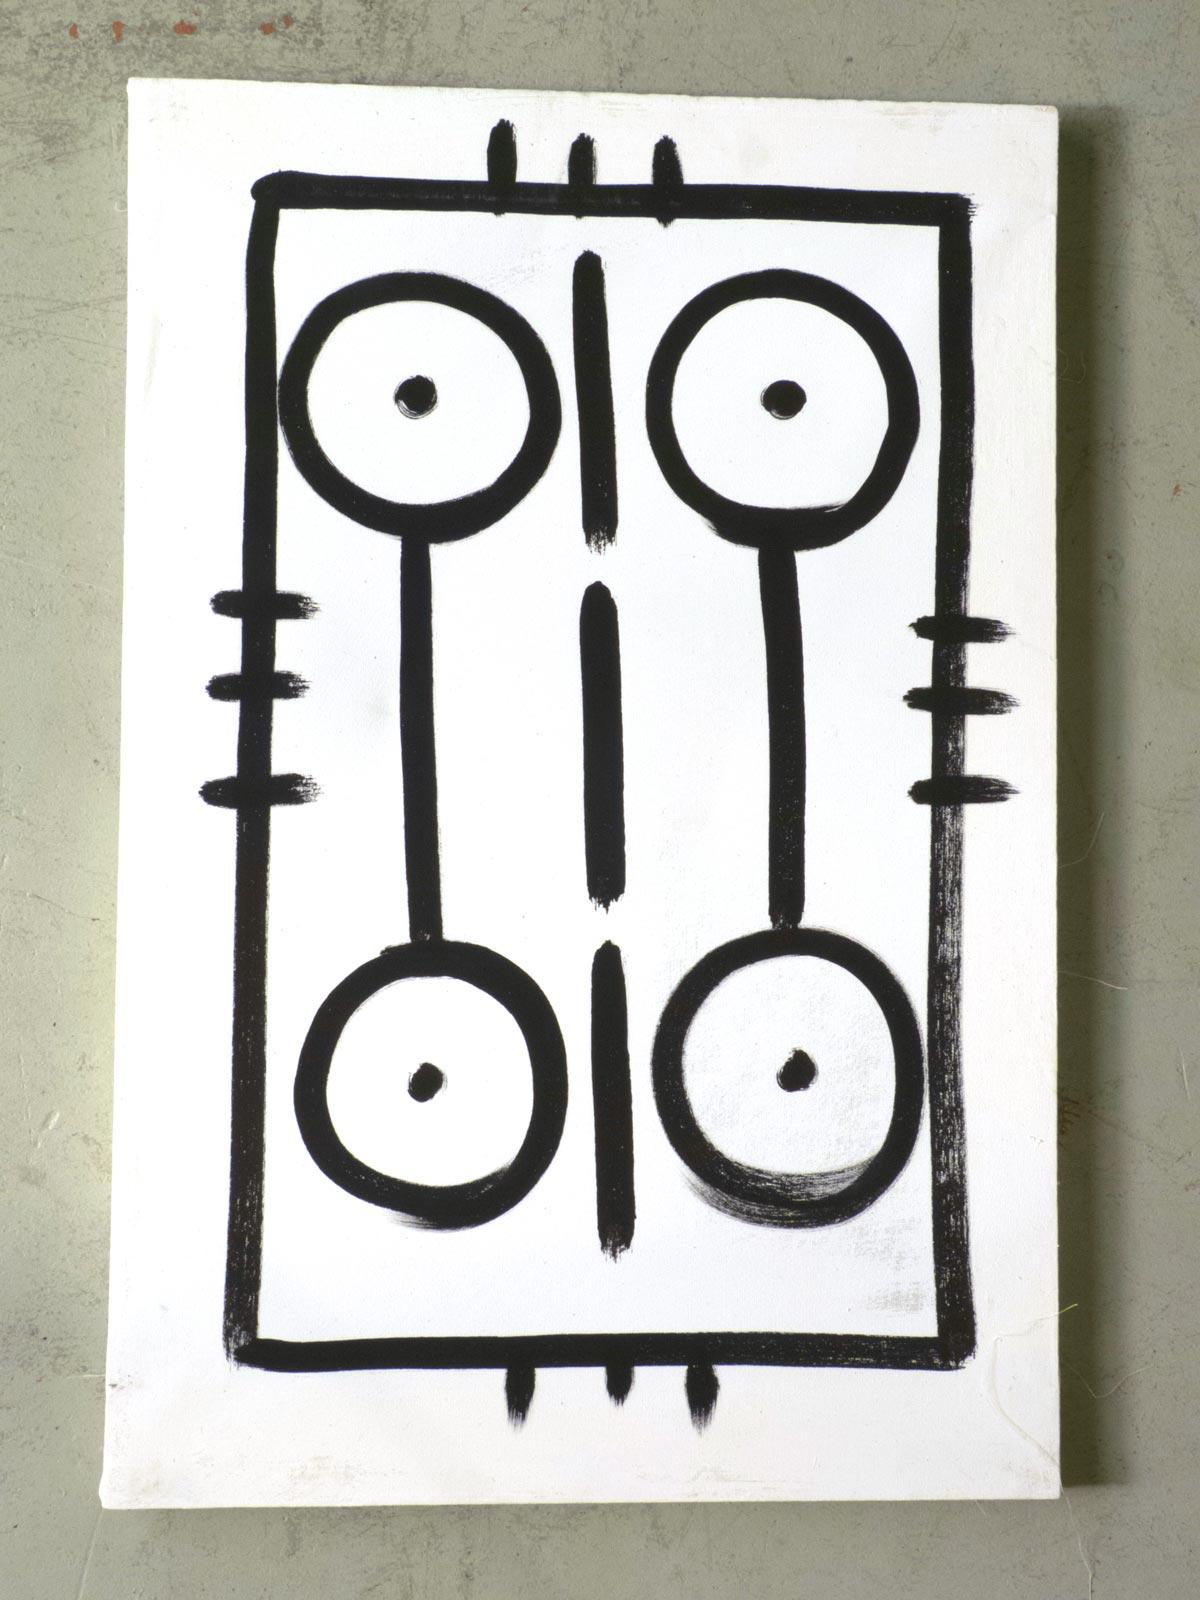 Urban-Manegold-There-is-no-Private-Privatleben-Privatsphäre-Rauminstallation-Experiment-Typographie-Portrait-Gesellschaft-Licht-Kunst-Transparent-LED-Madlight-portrait_multiplex_8